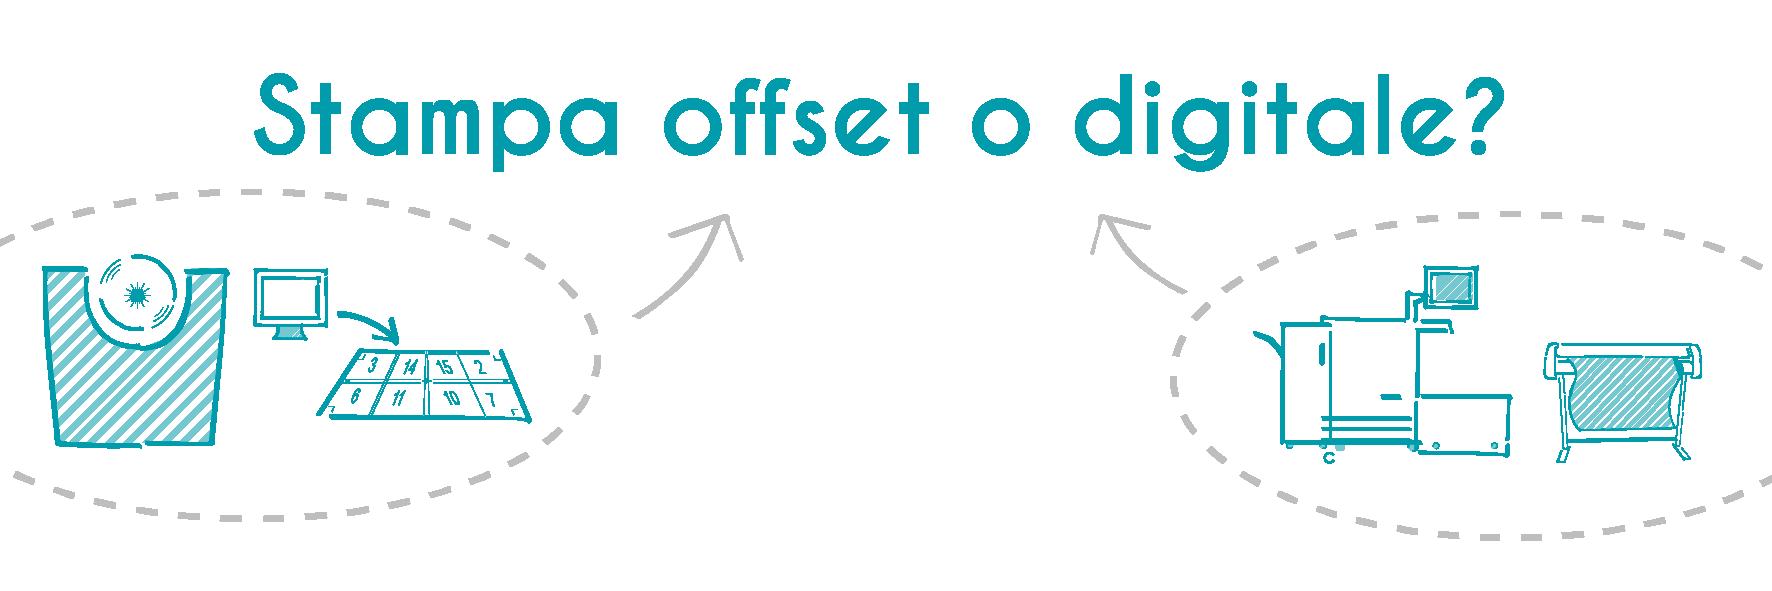 stampa offset o digitale